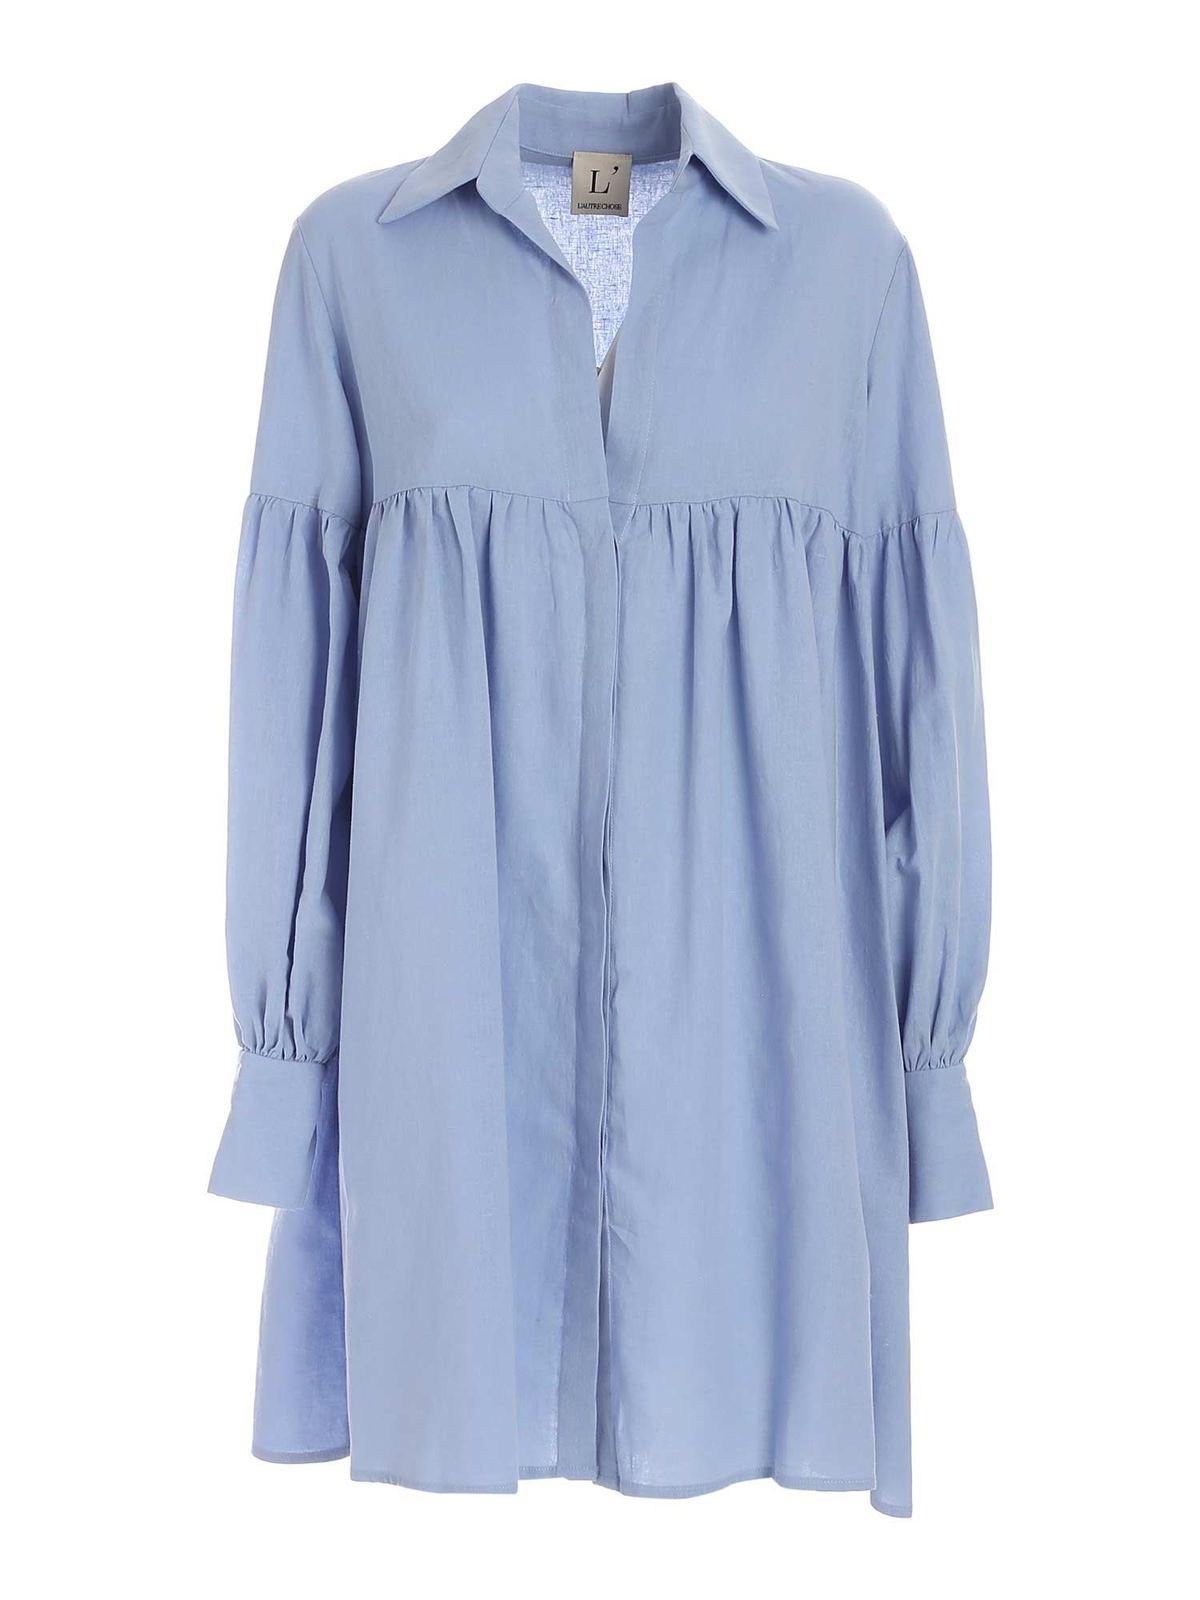 L'autre Chose OVERSIZED CHEMISIER DRESS IN LIGHT BLUE